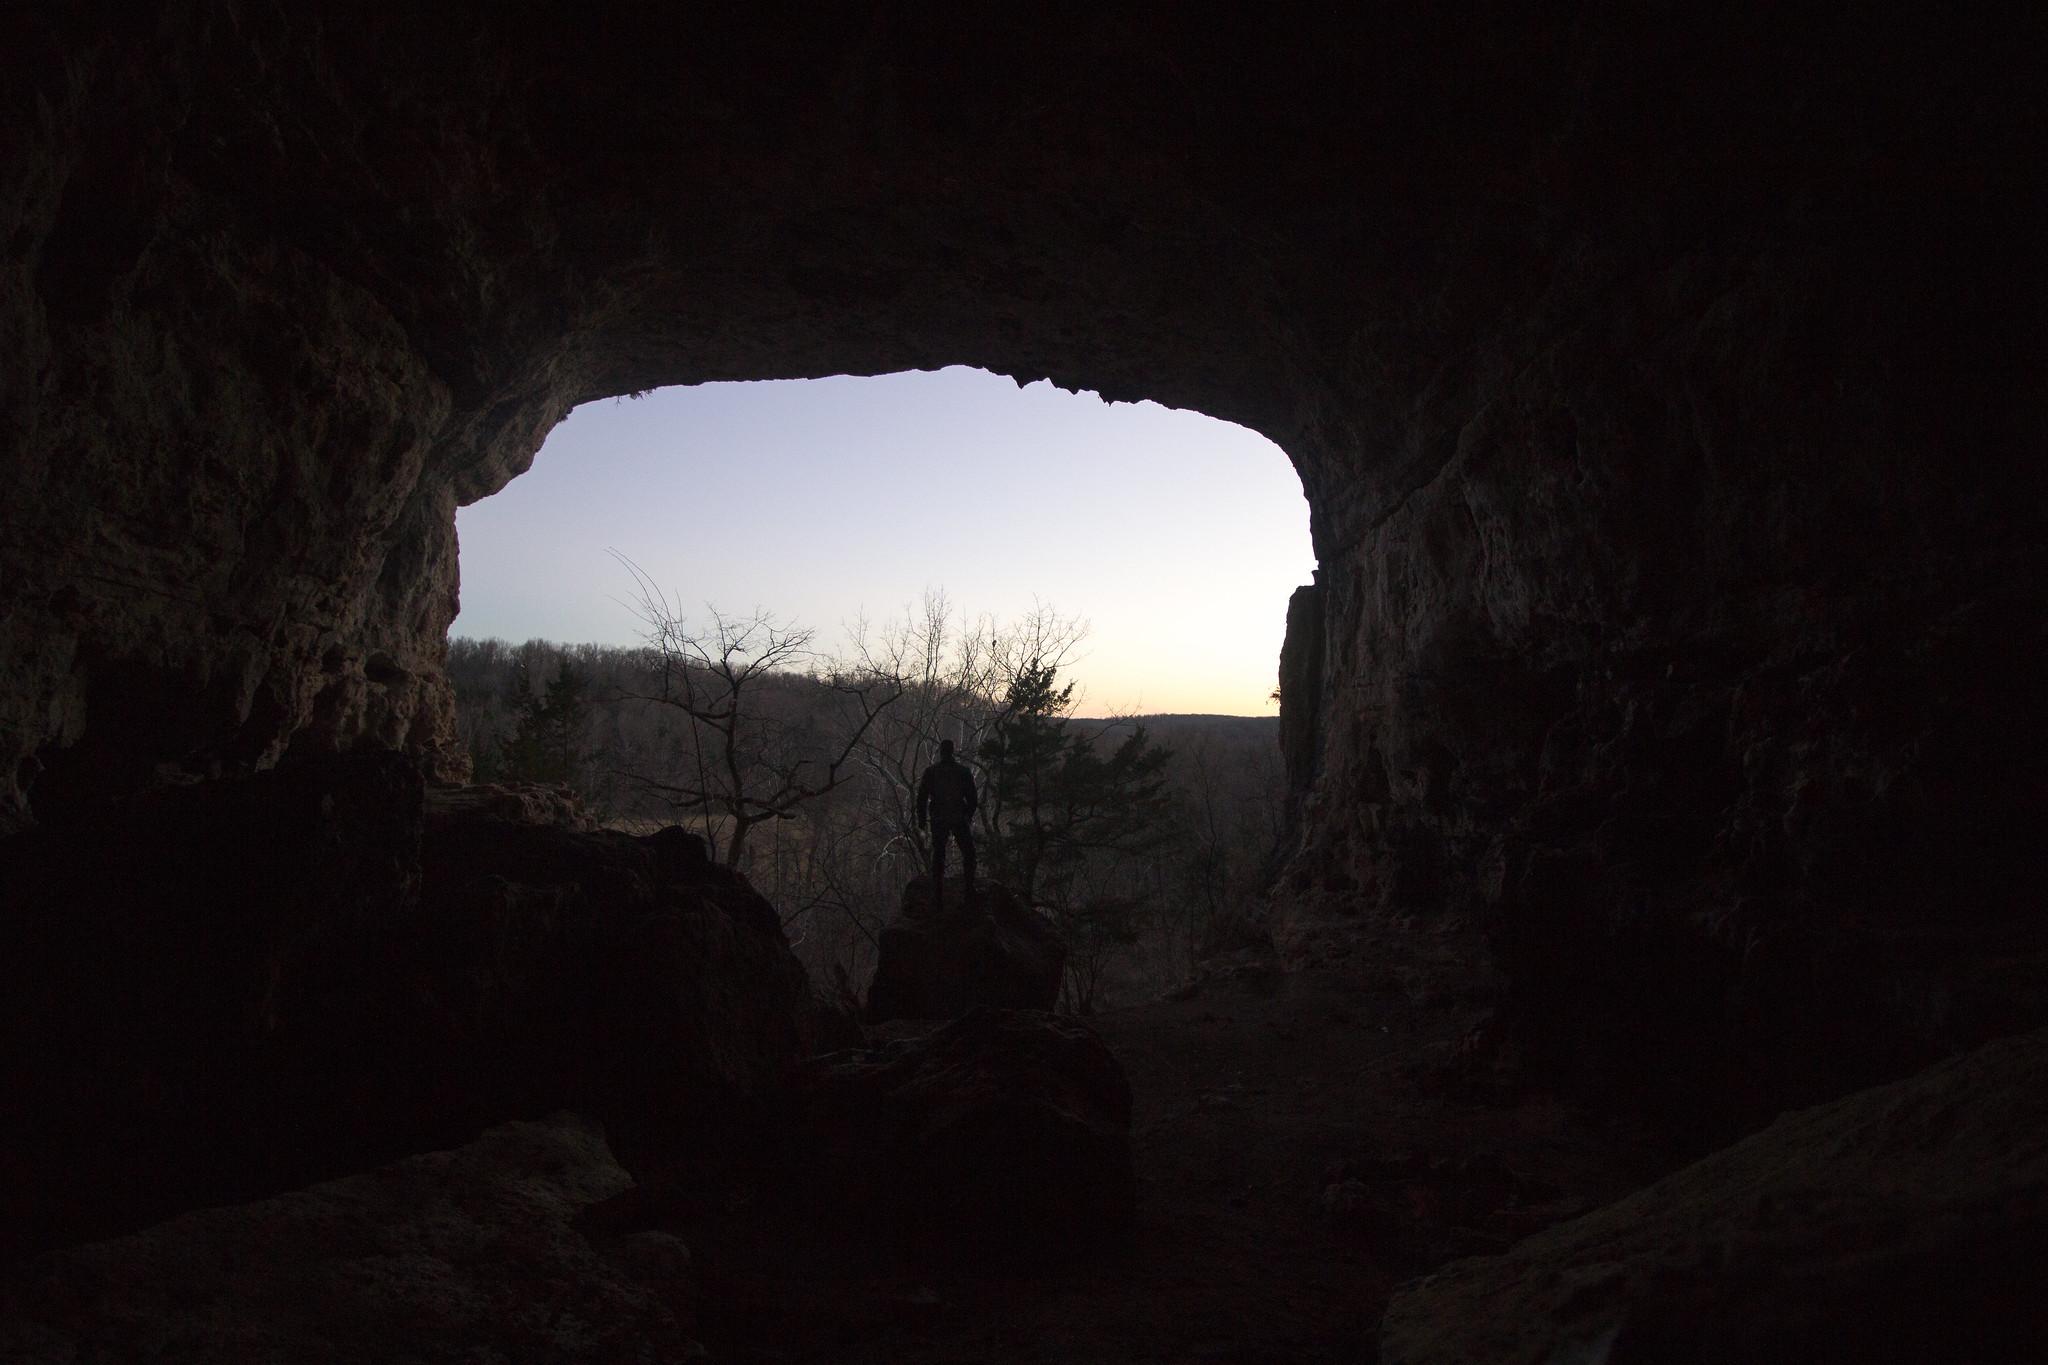 Yoark Cave, Missouri